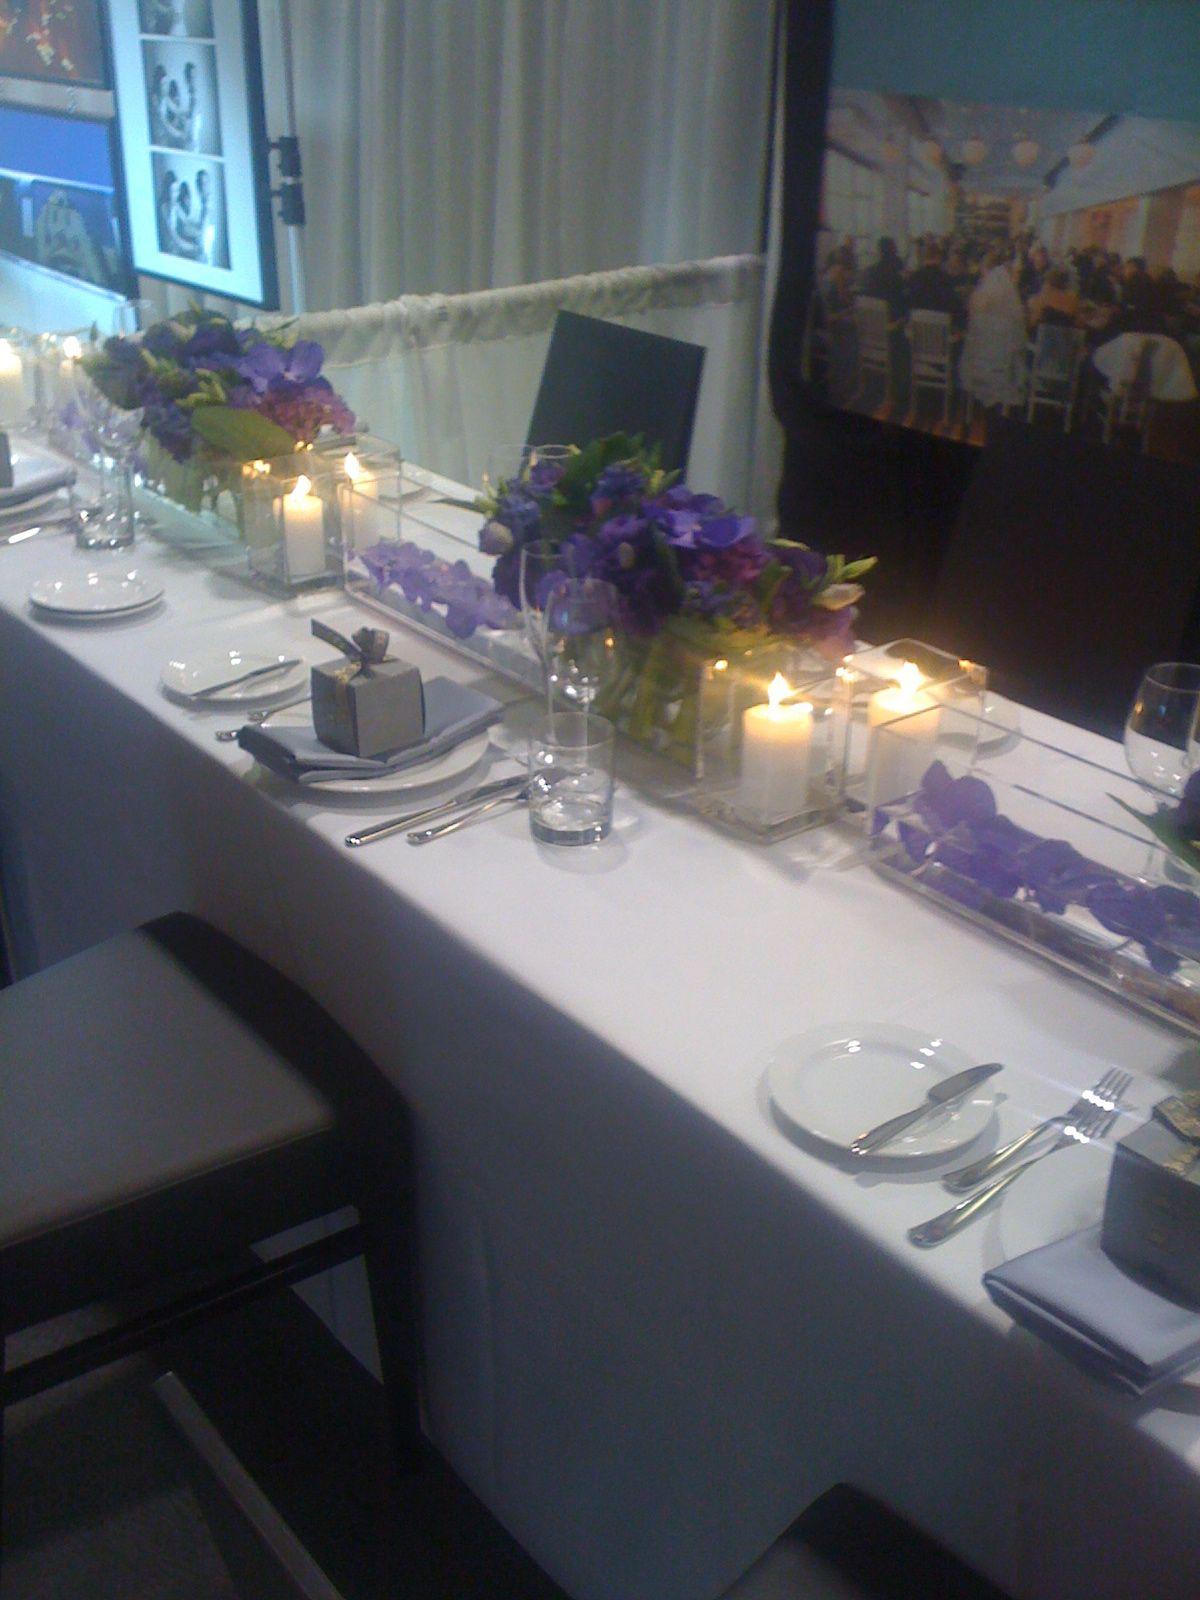 Country wedding centerpiece ideas on rectangular table rectangular country wedding centerpiece ideas on rectangular table rectangular tables centerpieces junglespirit Gallery